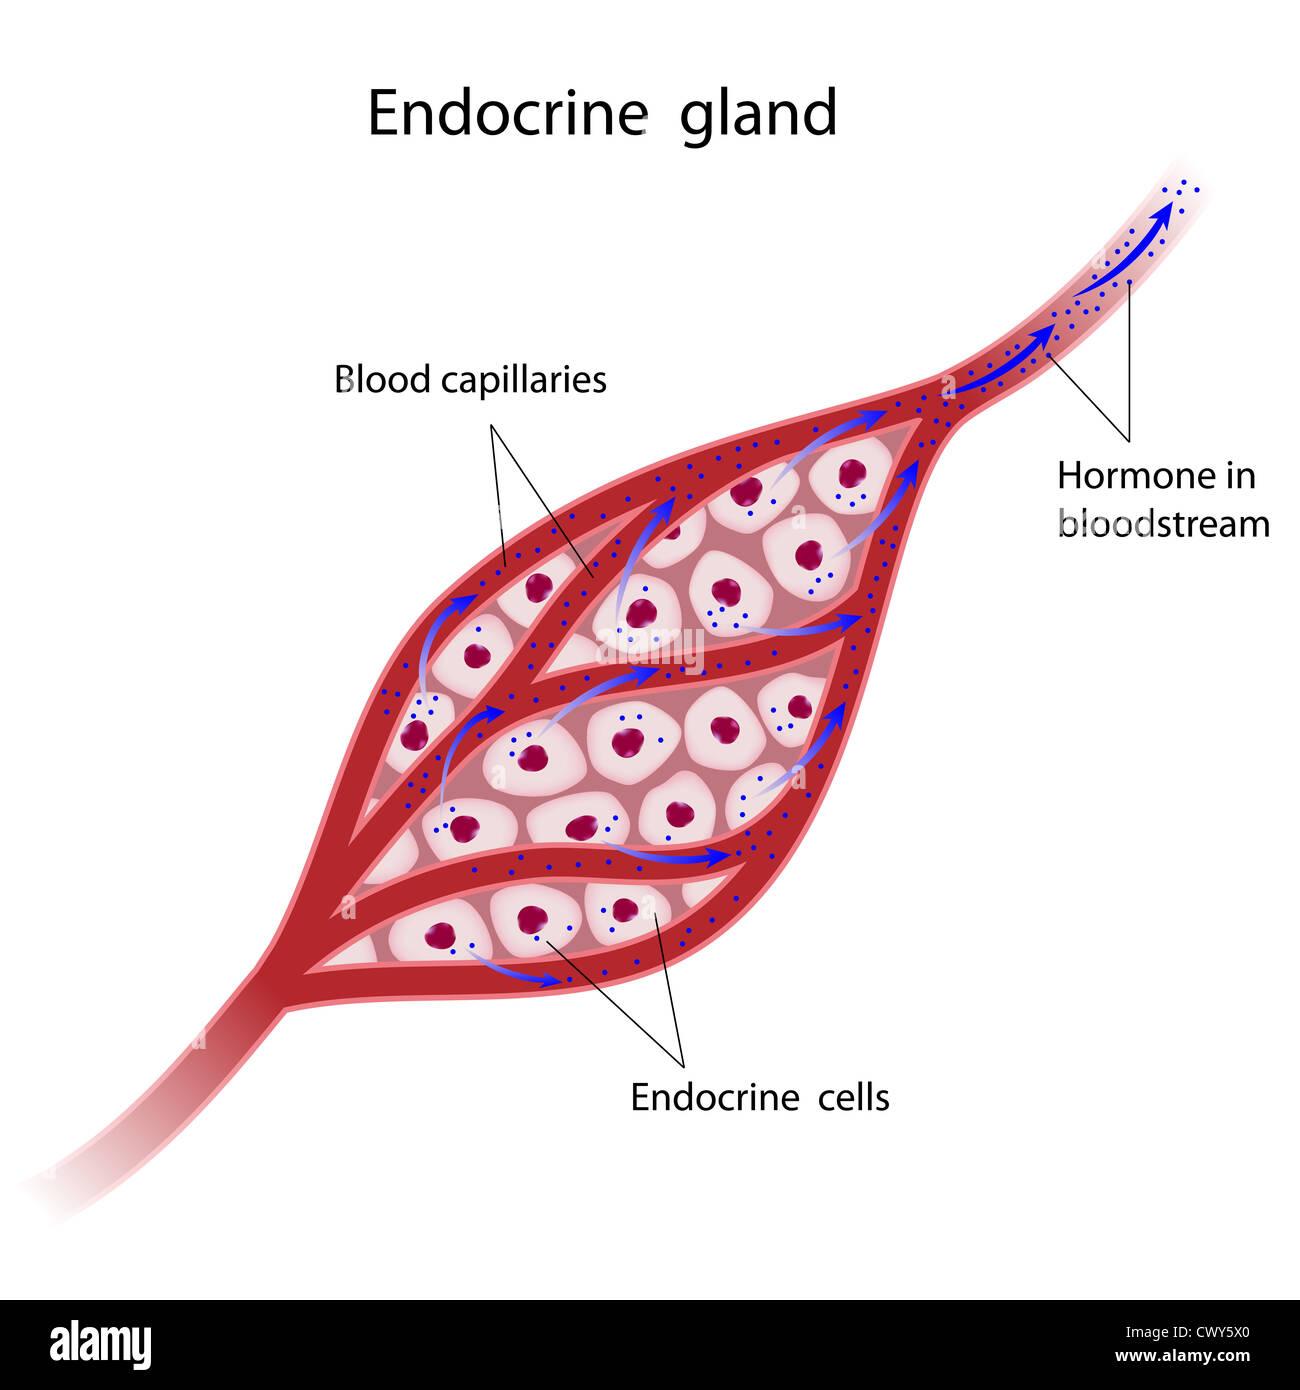 Endokrinen Drüsen Zellen Hormone direkt in den Blutstrom Stockfoto ...